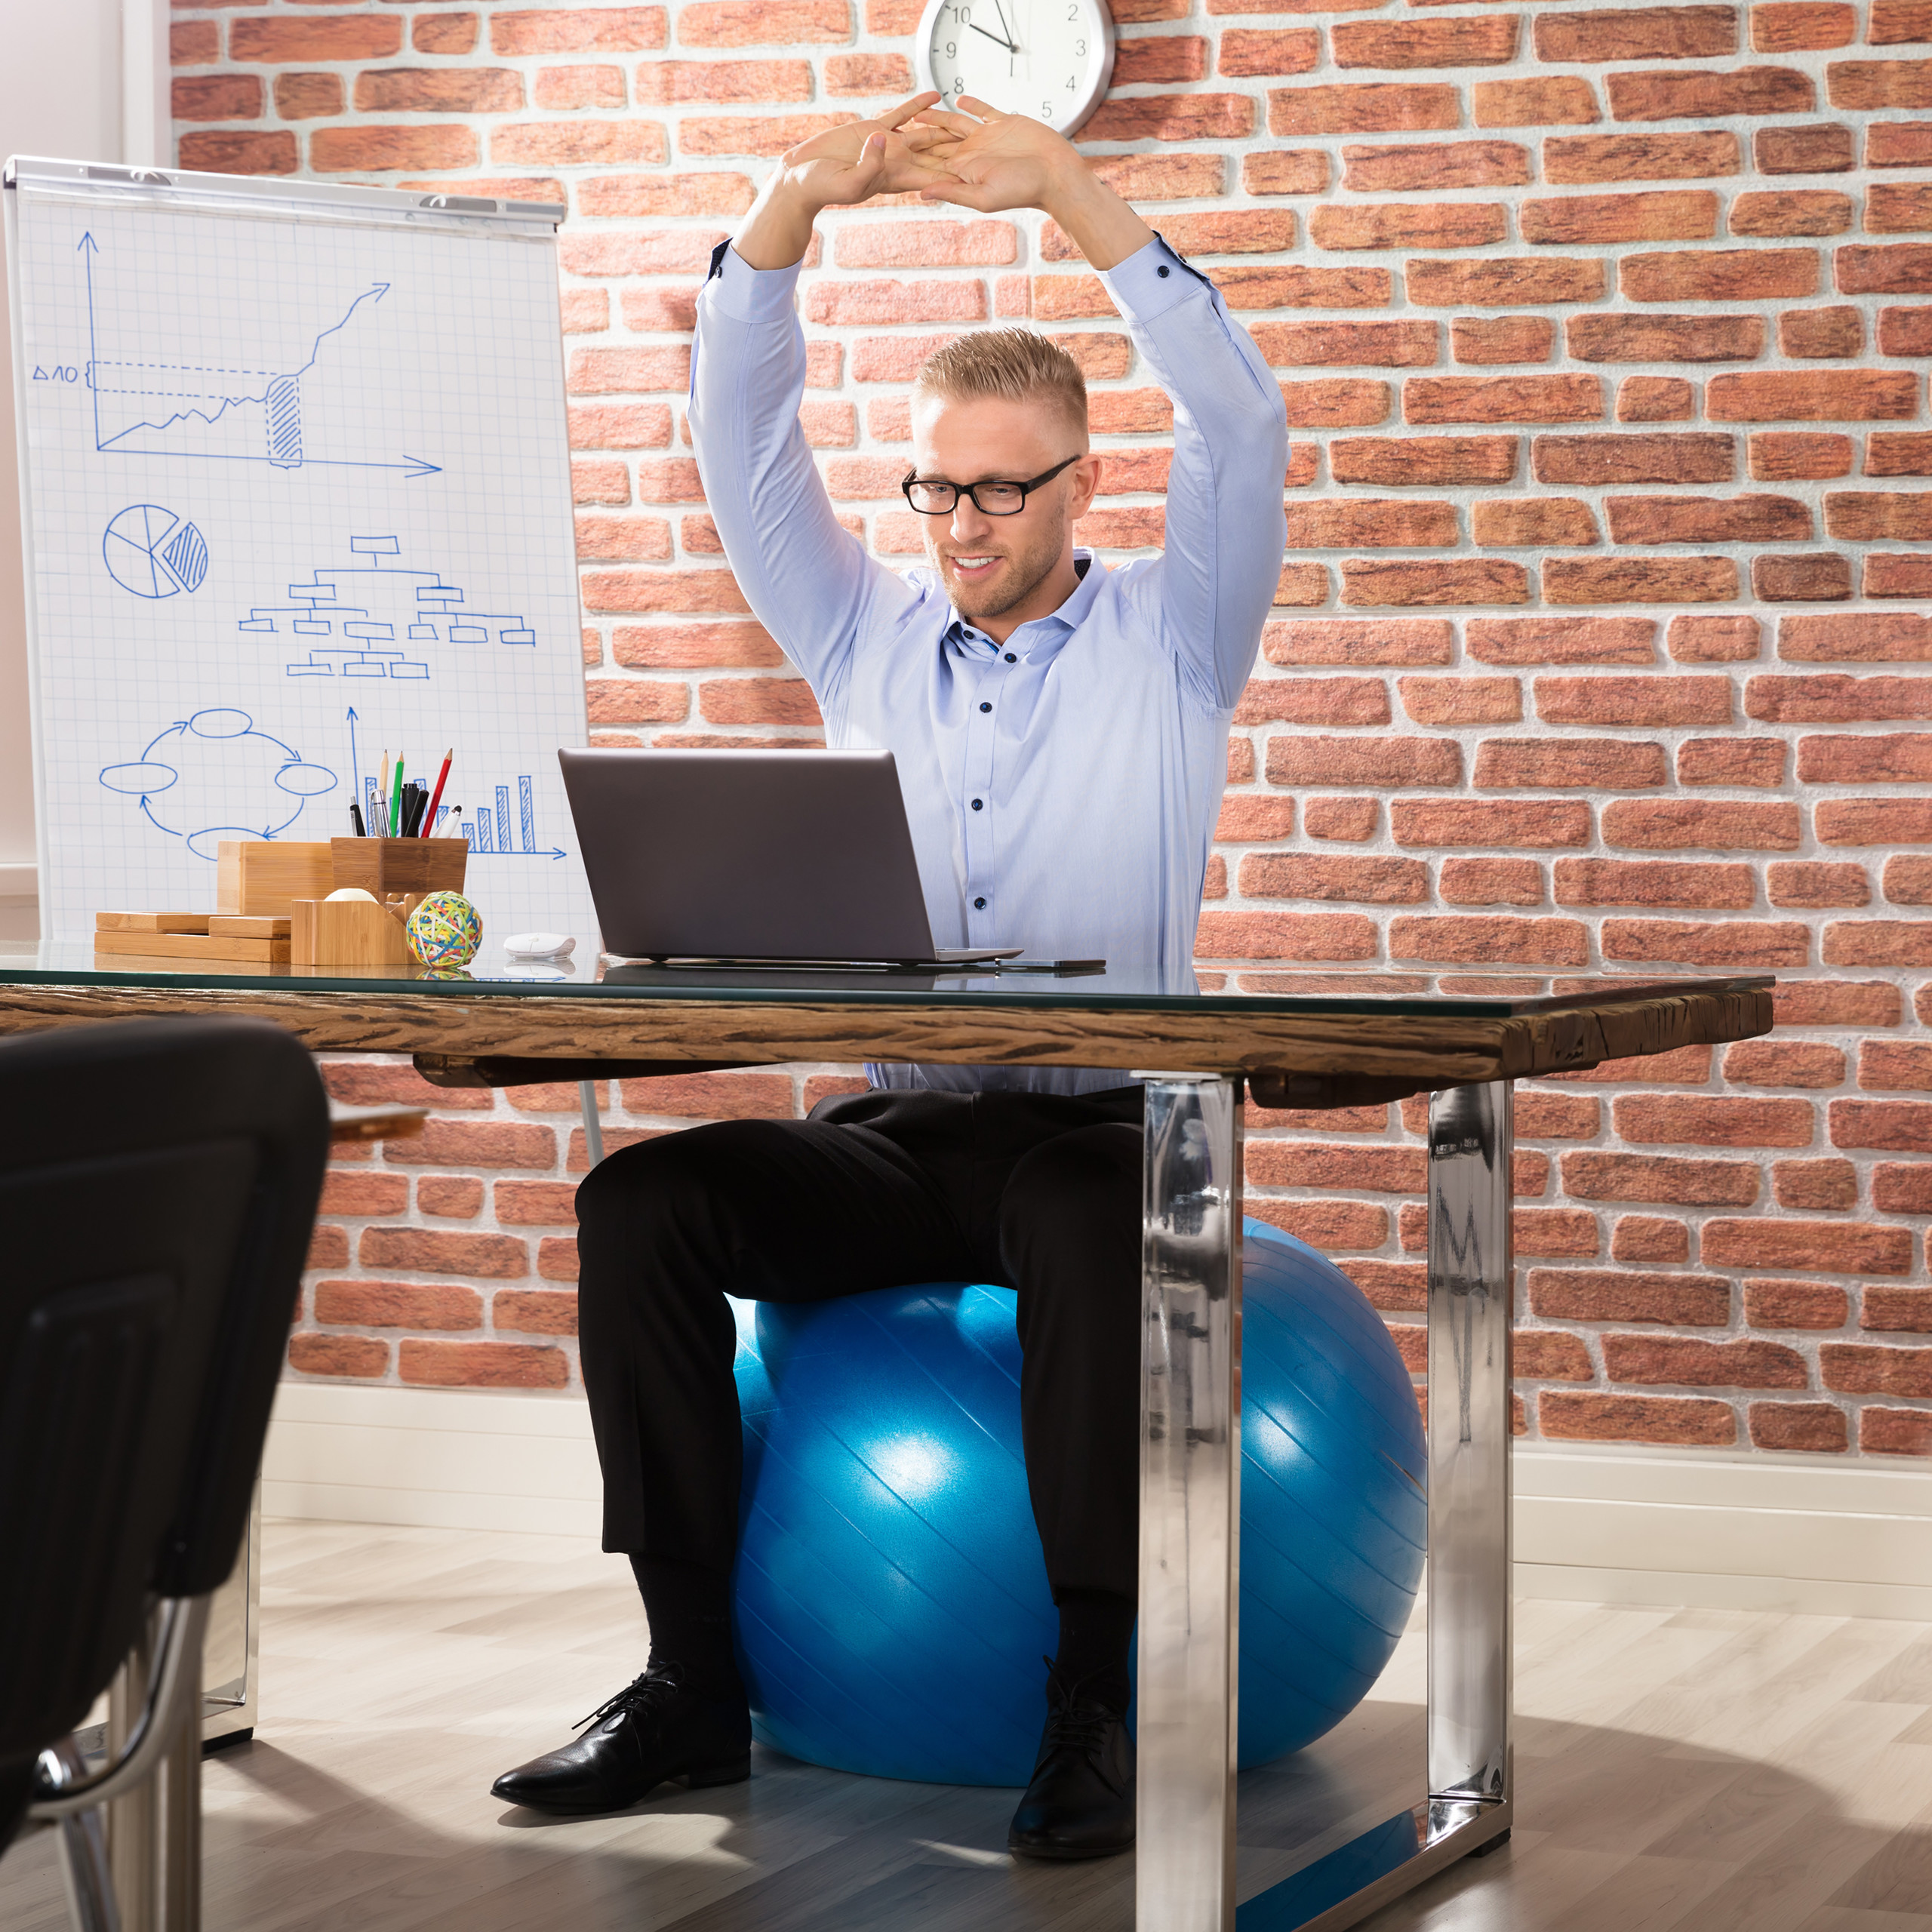 Exercise-Ball-75-cm-PVC-Yoga-Ball-Office-Seat-Gym-Ball-Pilates thumbnail 10